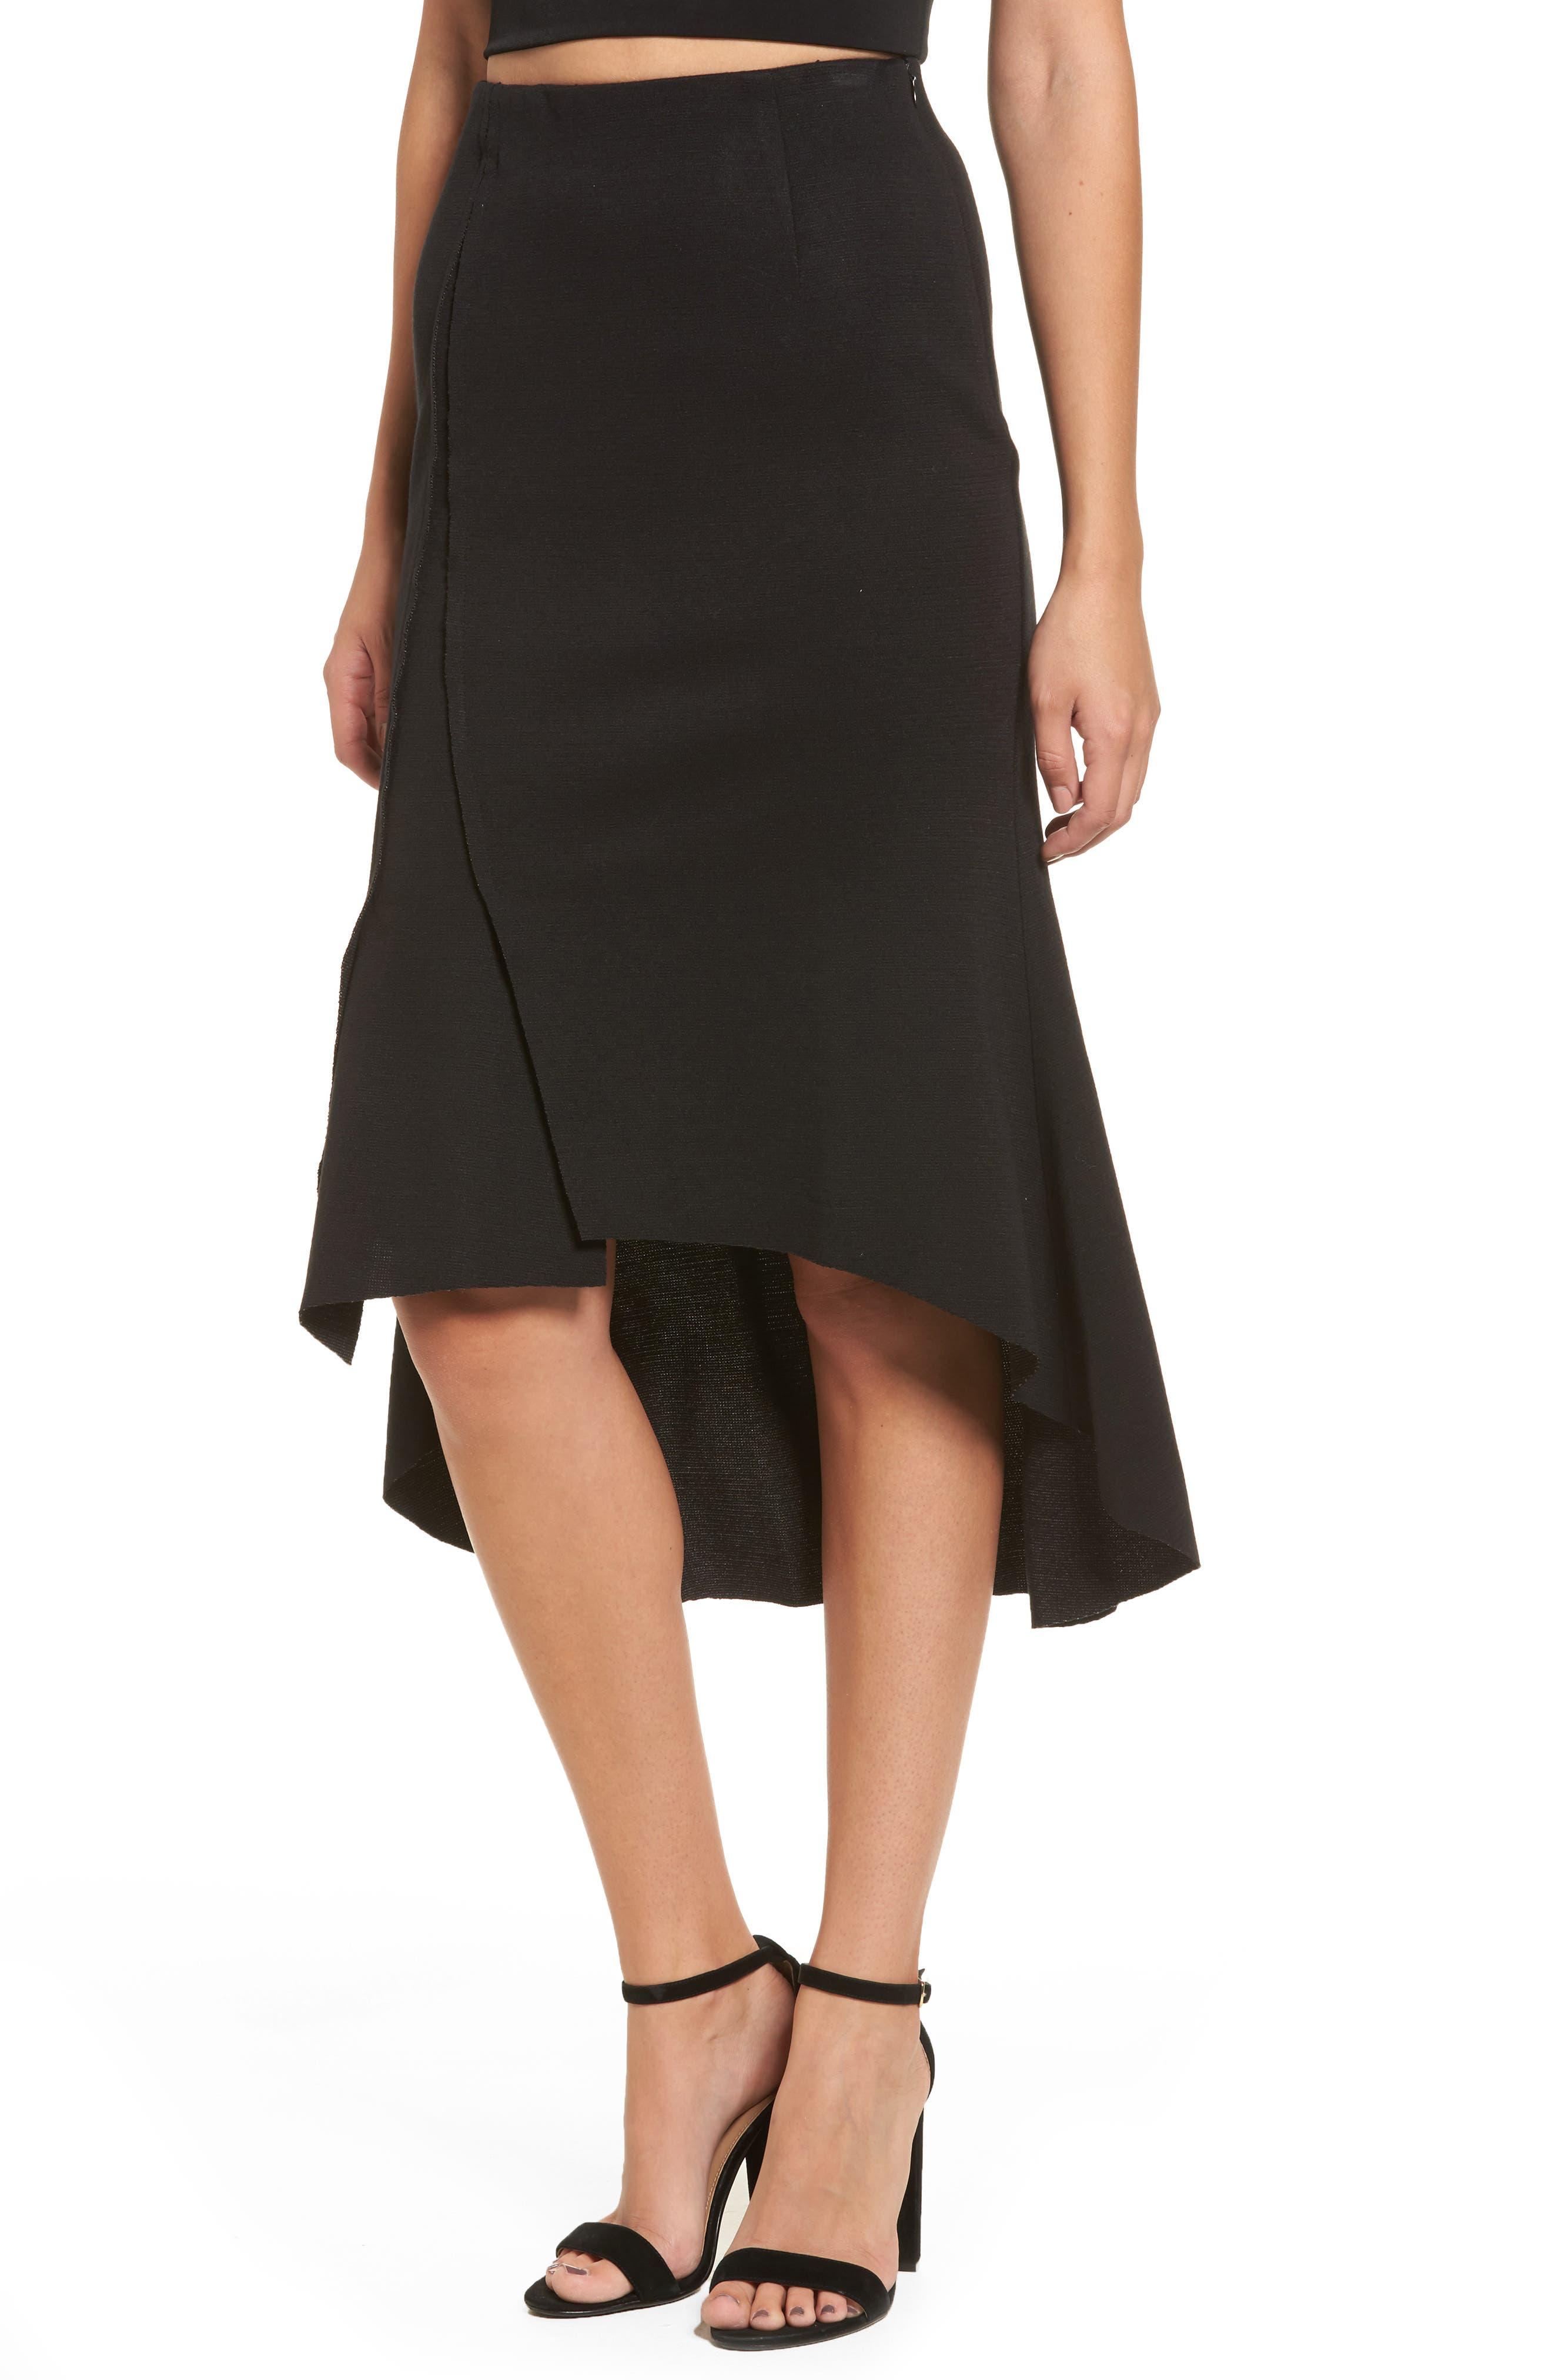 Alternate Image 1 Selected - Moon River Ruffle High/Low Skirt